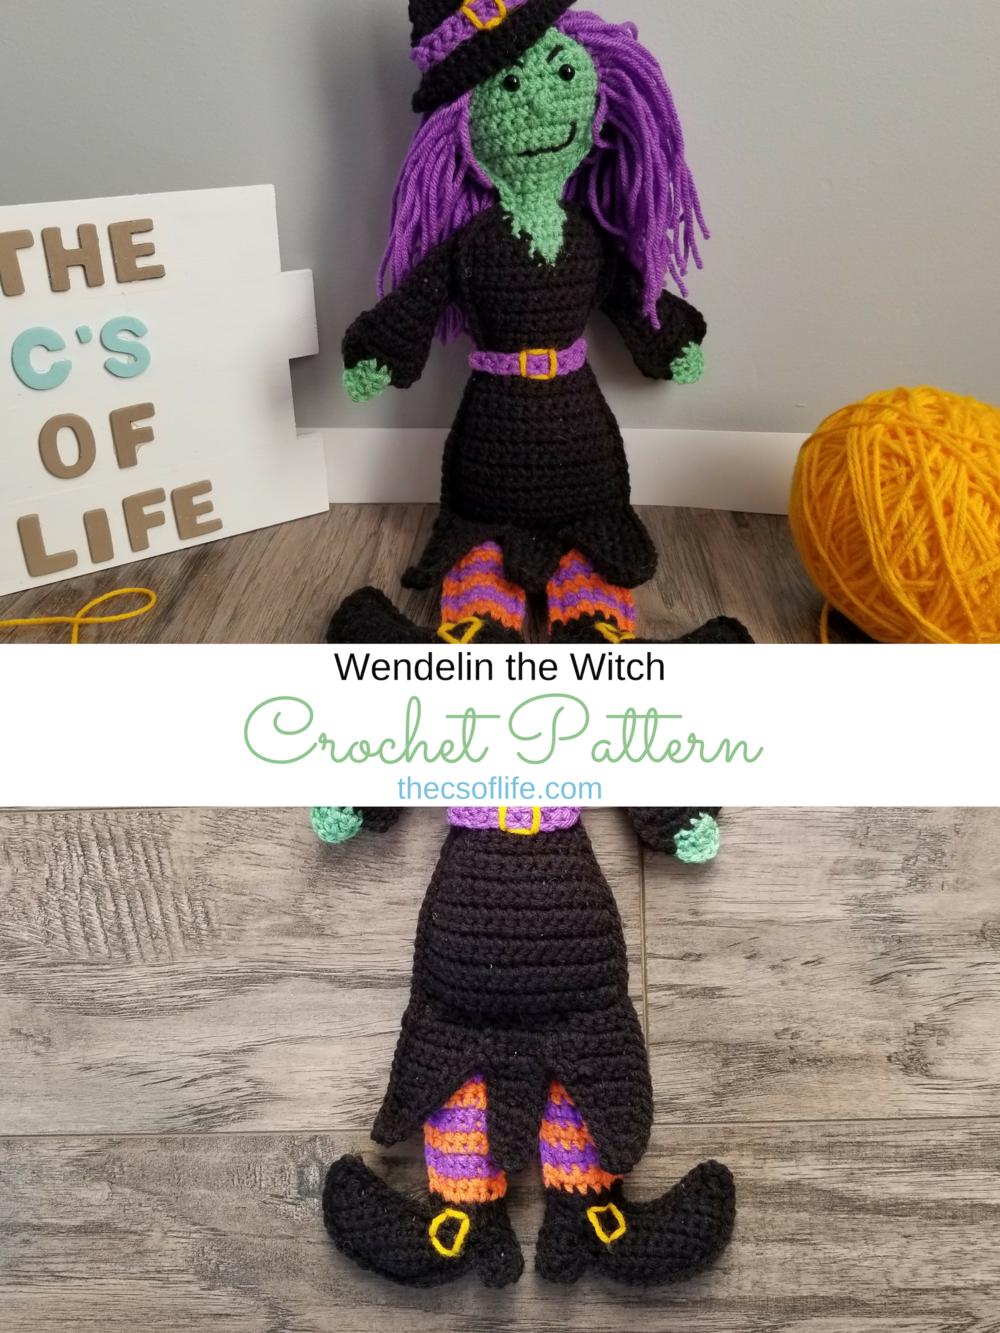 Wendelin the Witch - Crochet Pattern